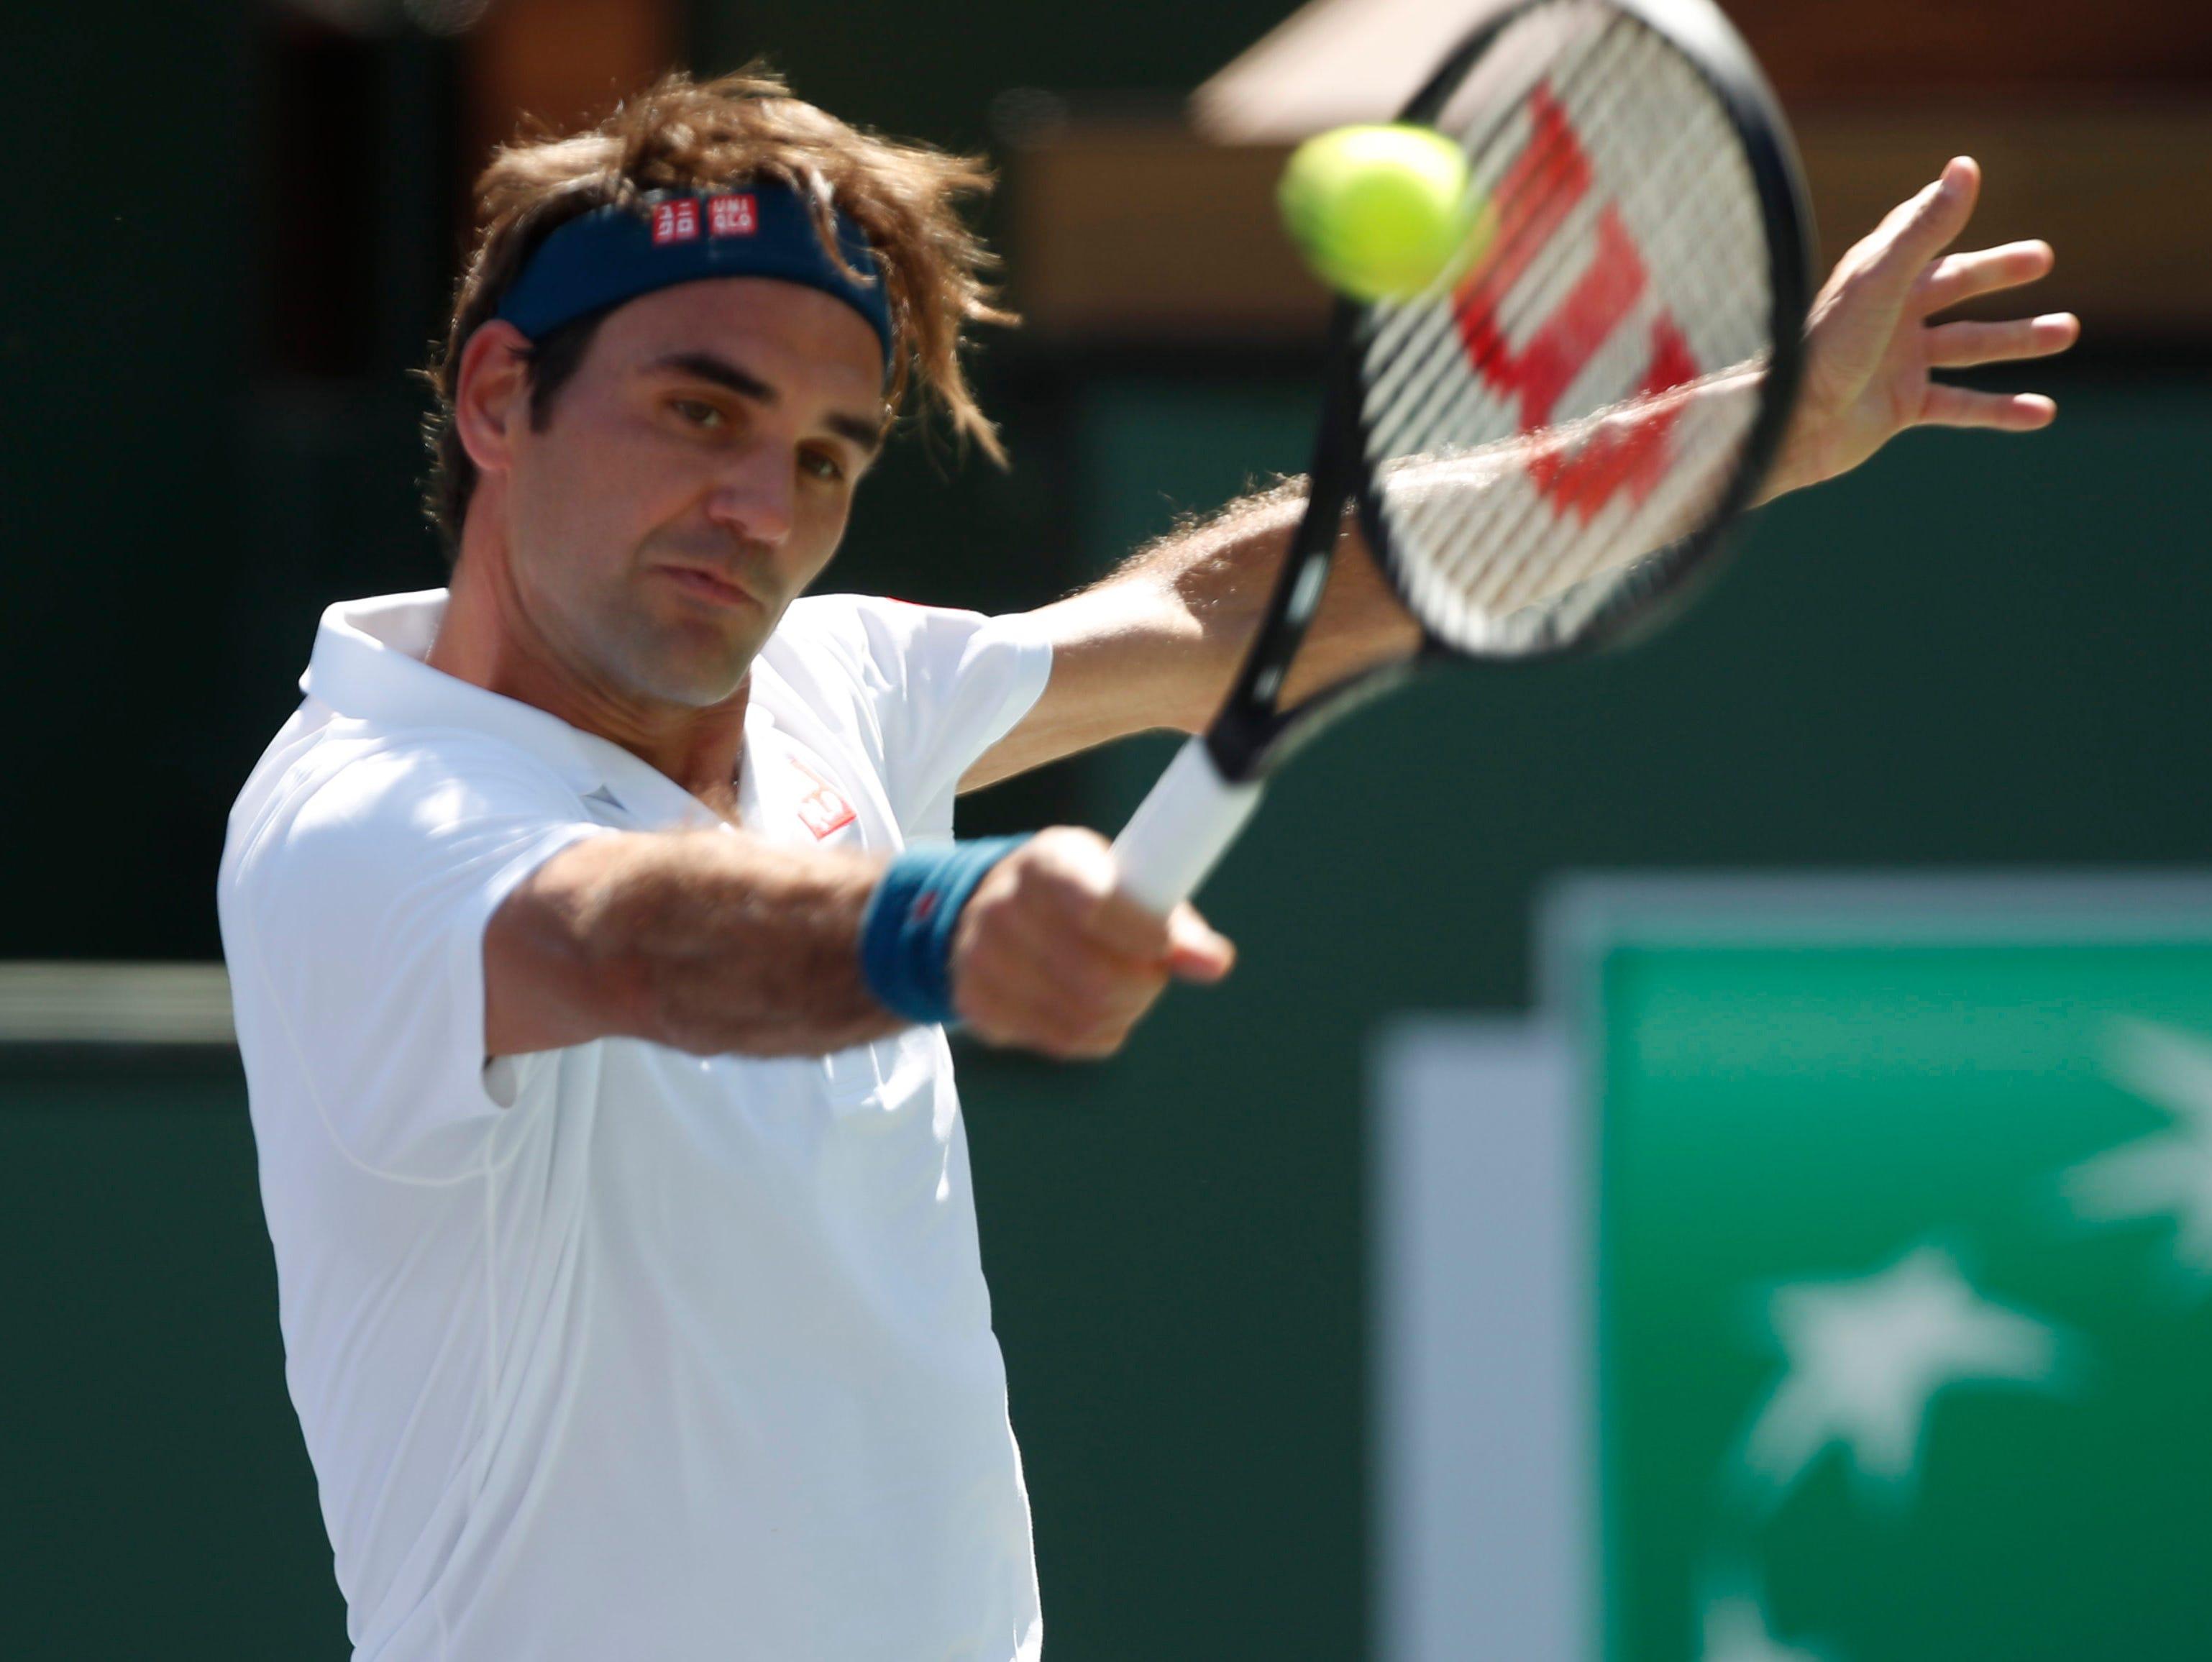 Roger Federer hits a backhand during his quarterfinal match against Hubert Hurkacz on Stadium One at the 2019 BNP Paribas Open at Indian Wells Tennis Garden on March 15, 2019. Federer won 6-4, 6-4.